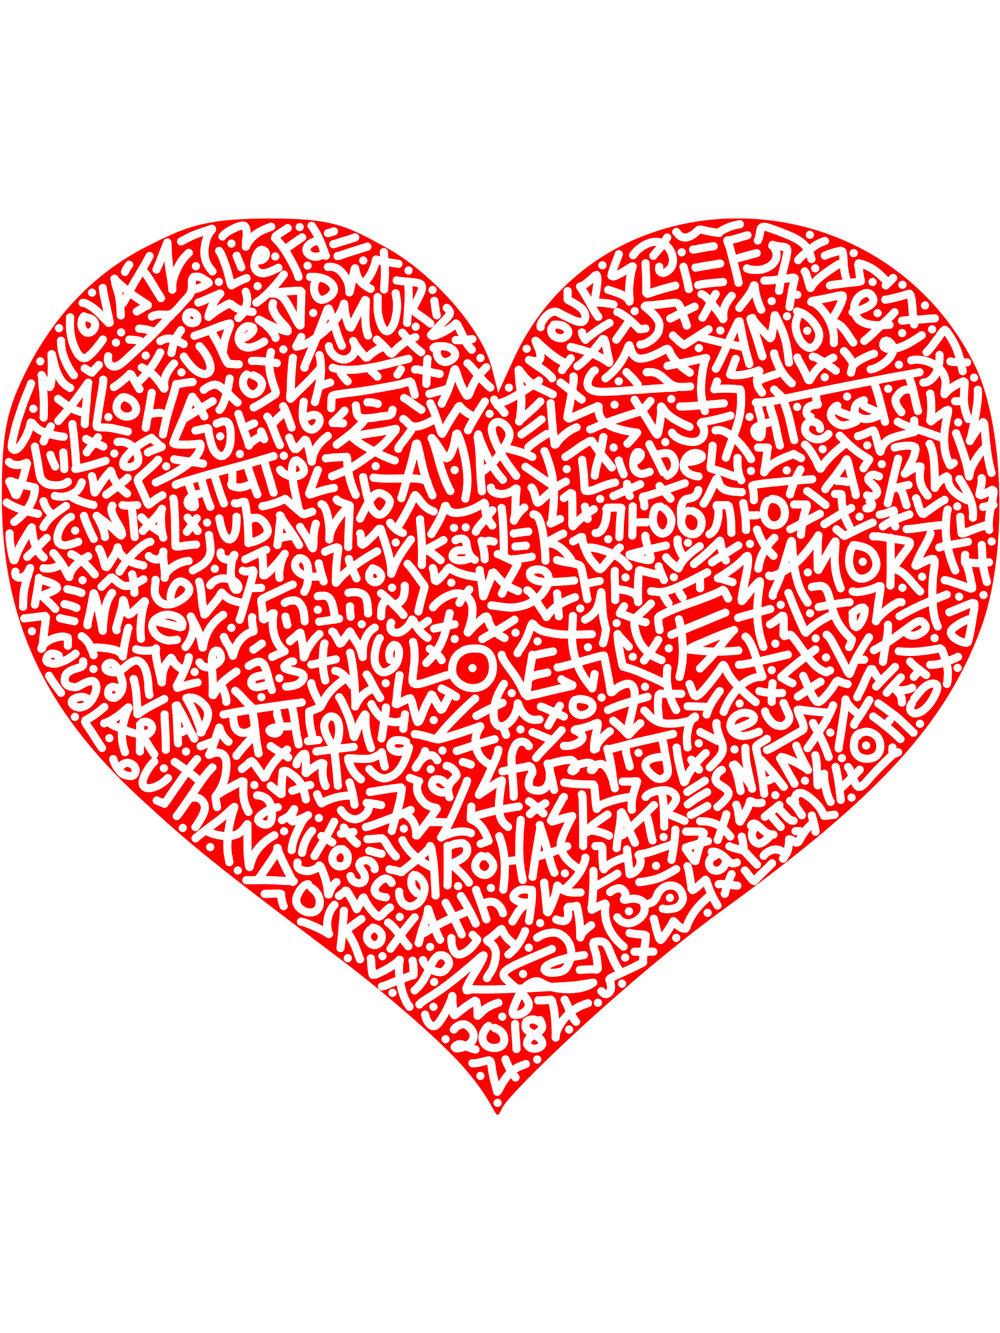 12x16 ONE LOVE TEST.jpg